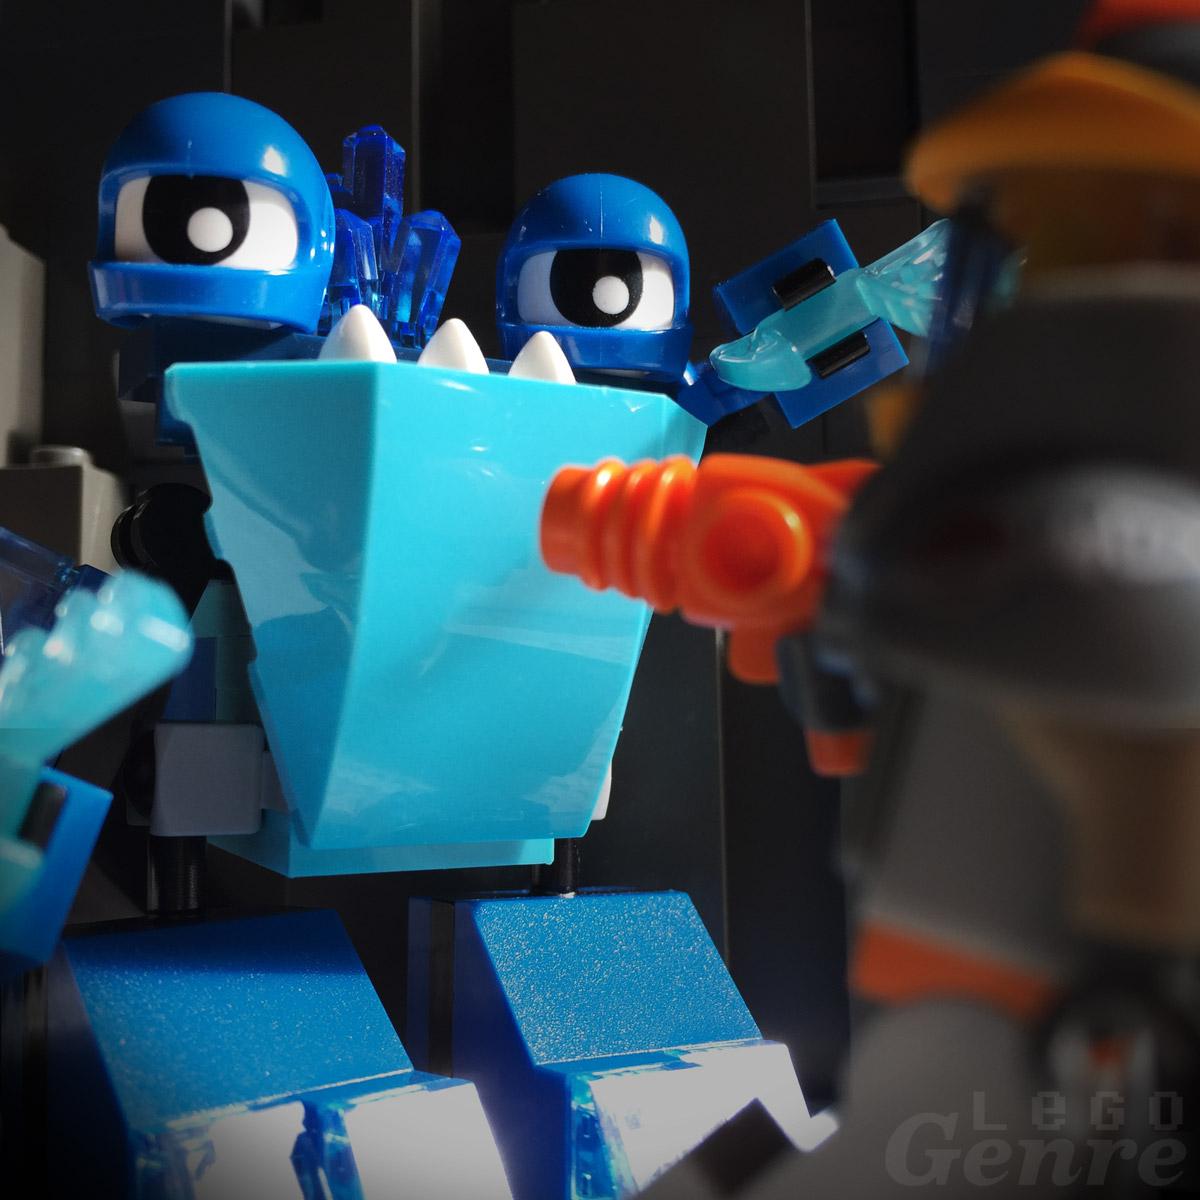 LegoGenre: Blue vs Orange